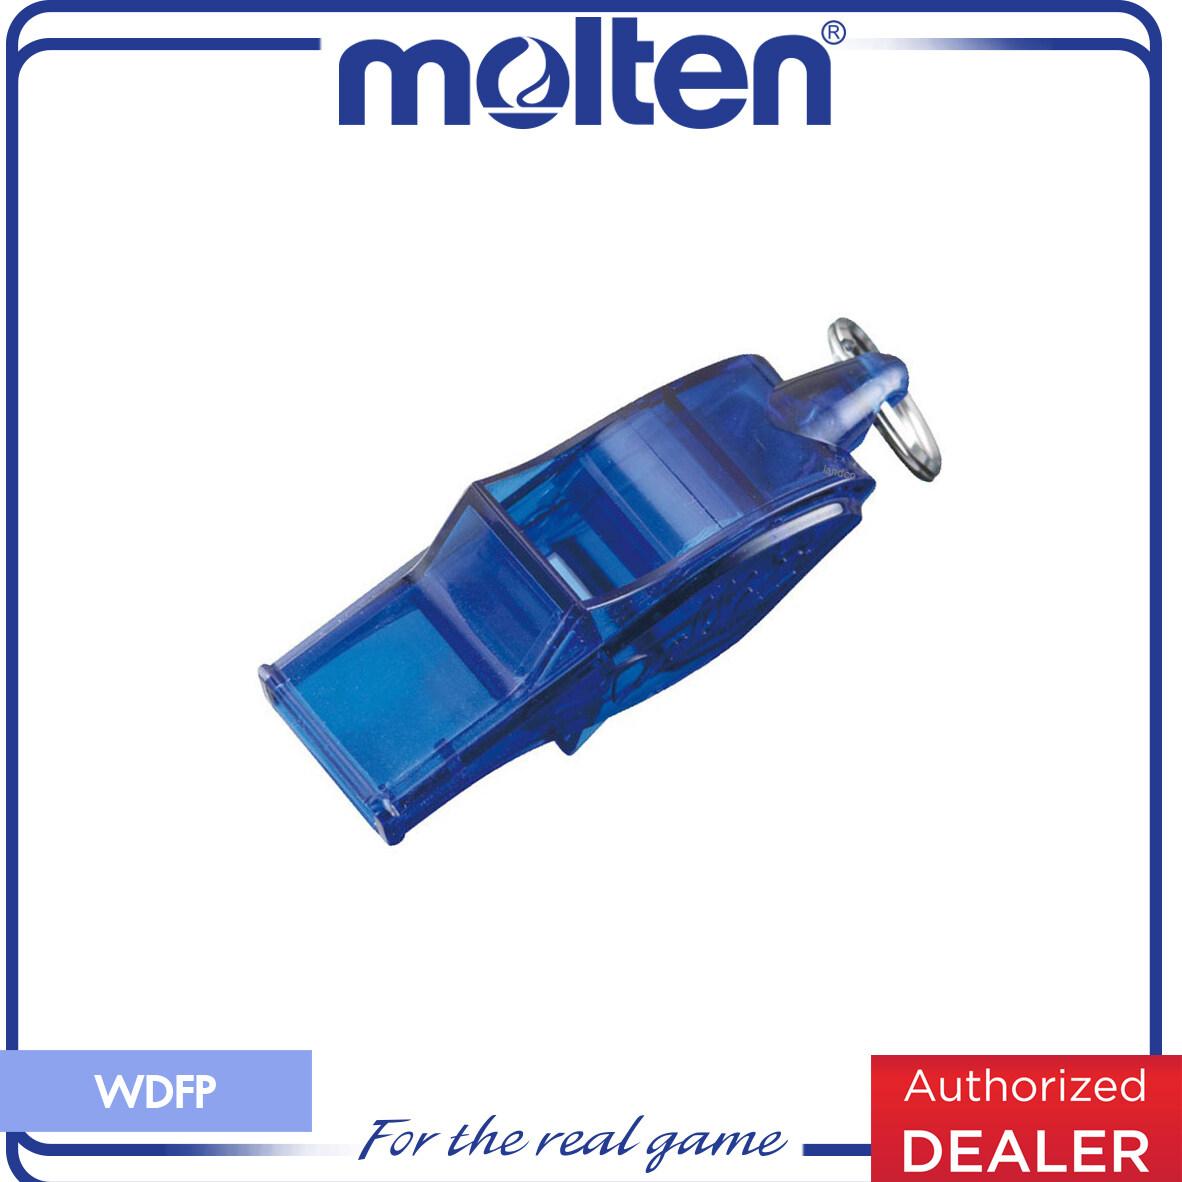 Molten นกหวีด Whistle Molten Dolfin Pro รุ่น Wdfp - สีน้ำเงิน.